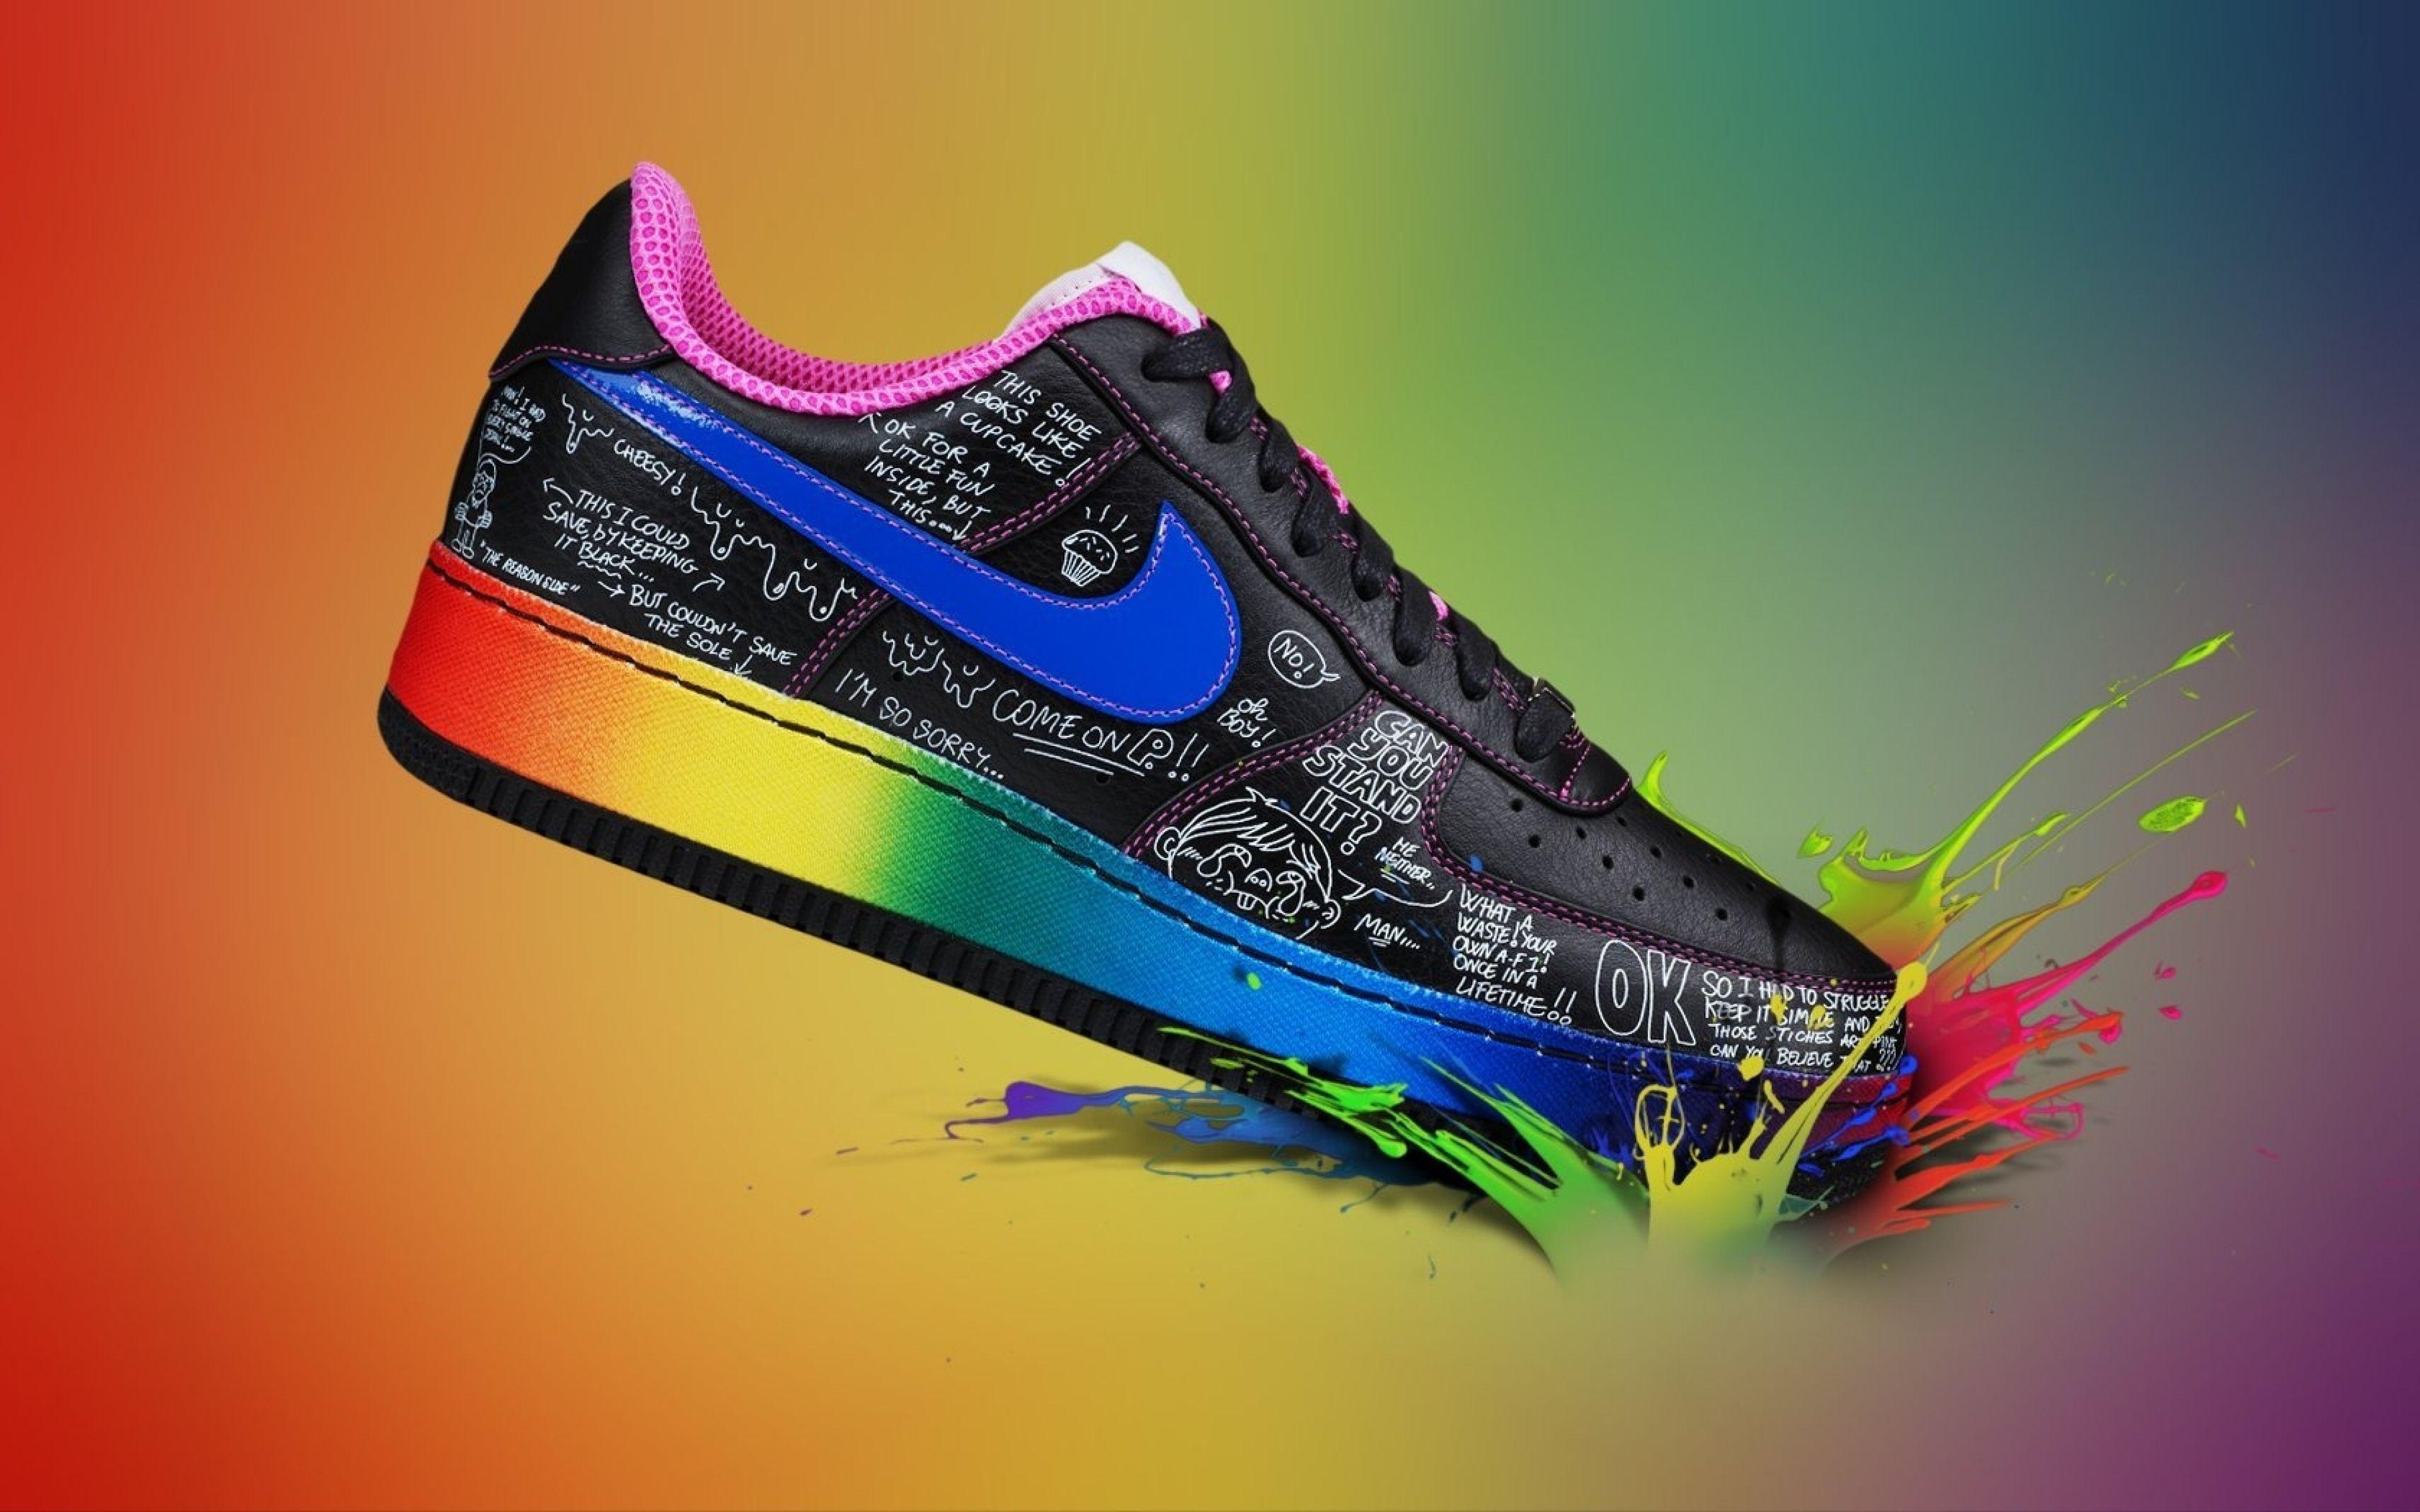 4K Nike Wallpapers - Top Free 4K Nike Backgrounds ...